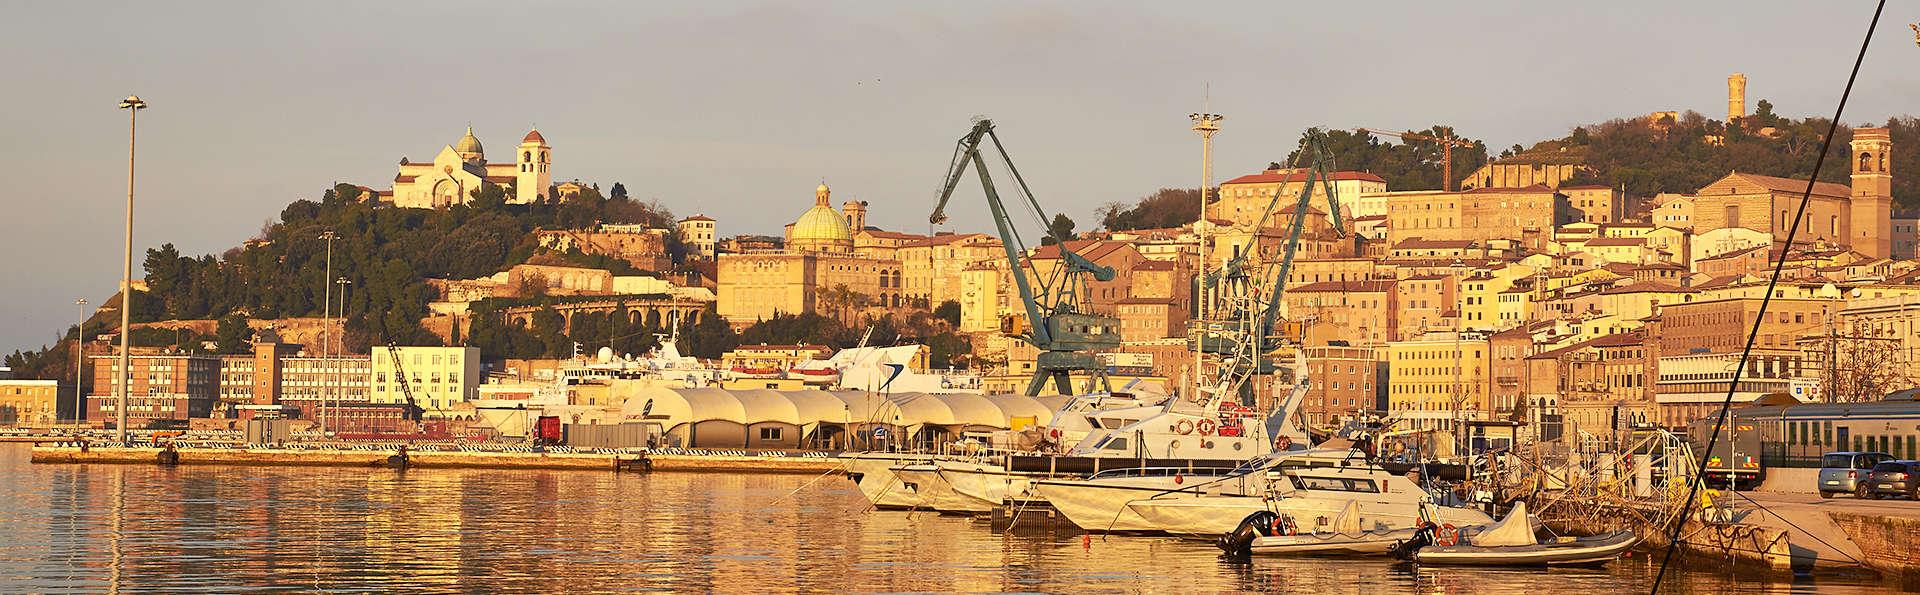 EGO Hotel Ancona - edit_Fotolia_75127688_ancona.jpg